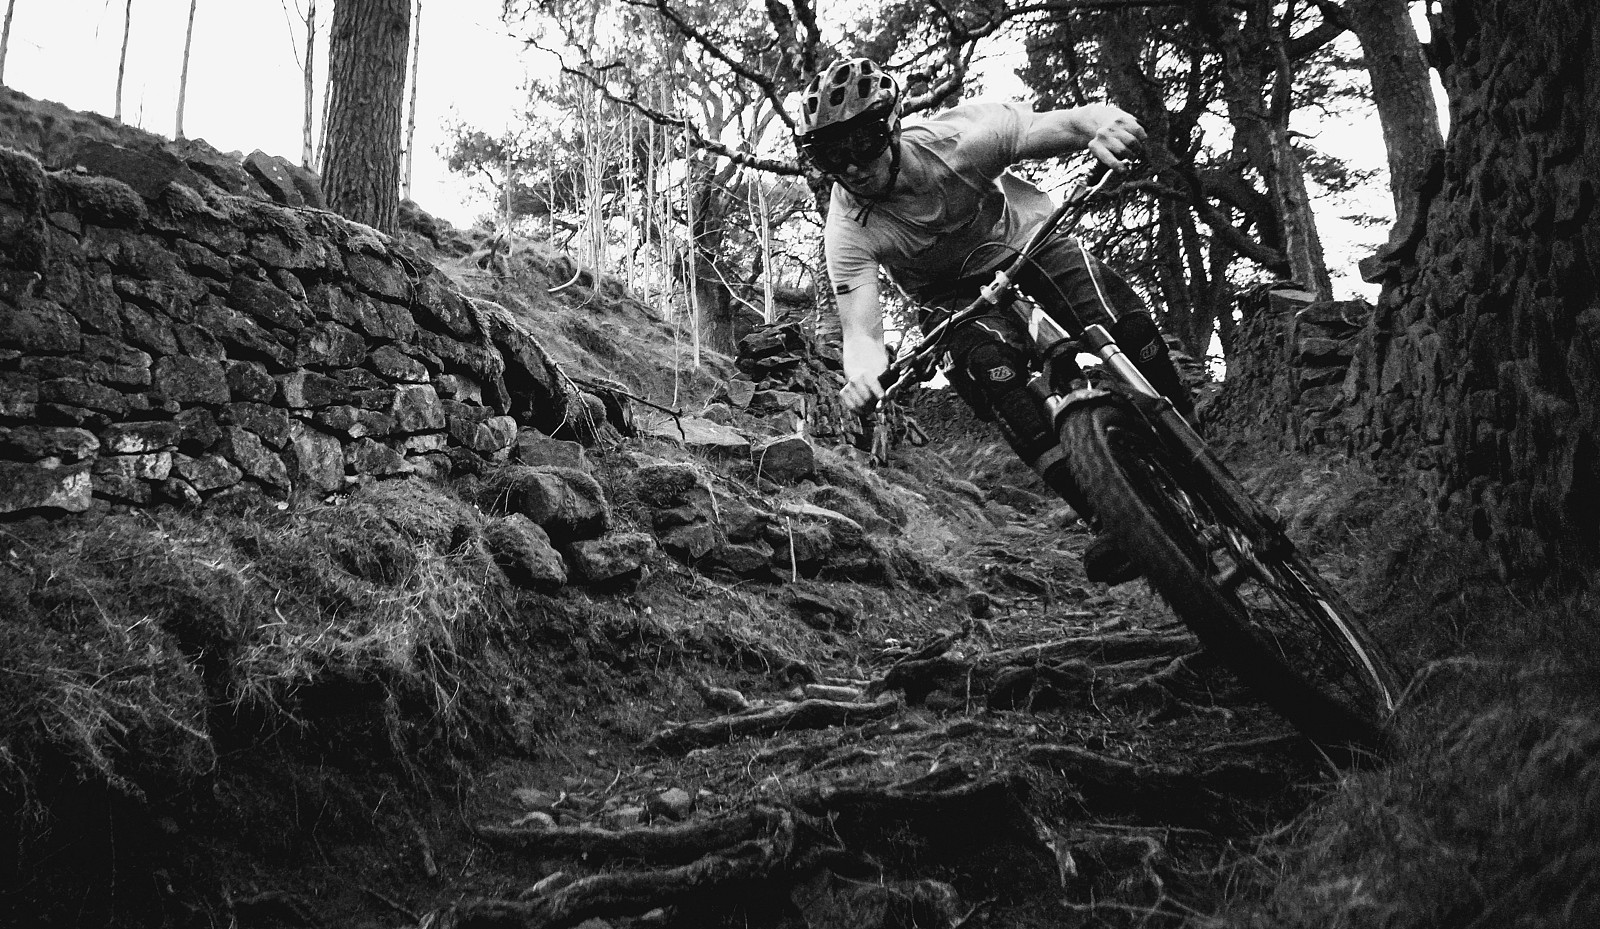 DSC09380 (2) - Mushrum - Mountain Biking Pictures - Vital MTB